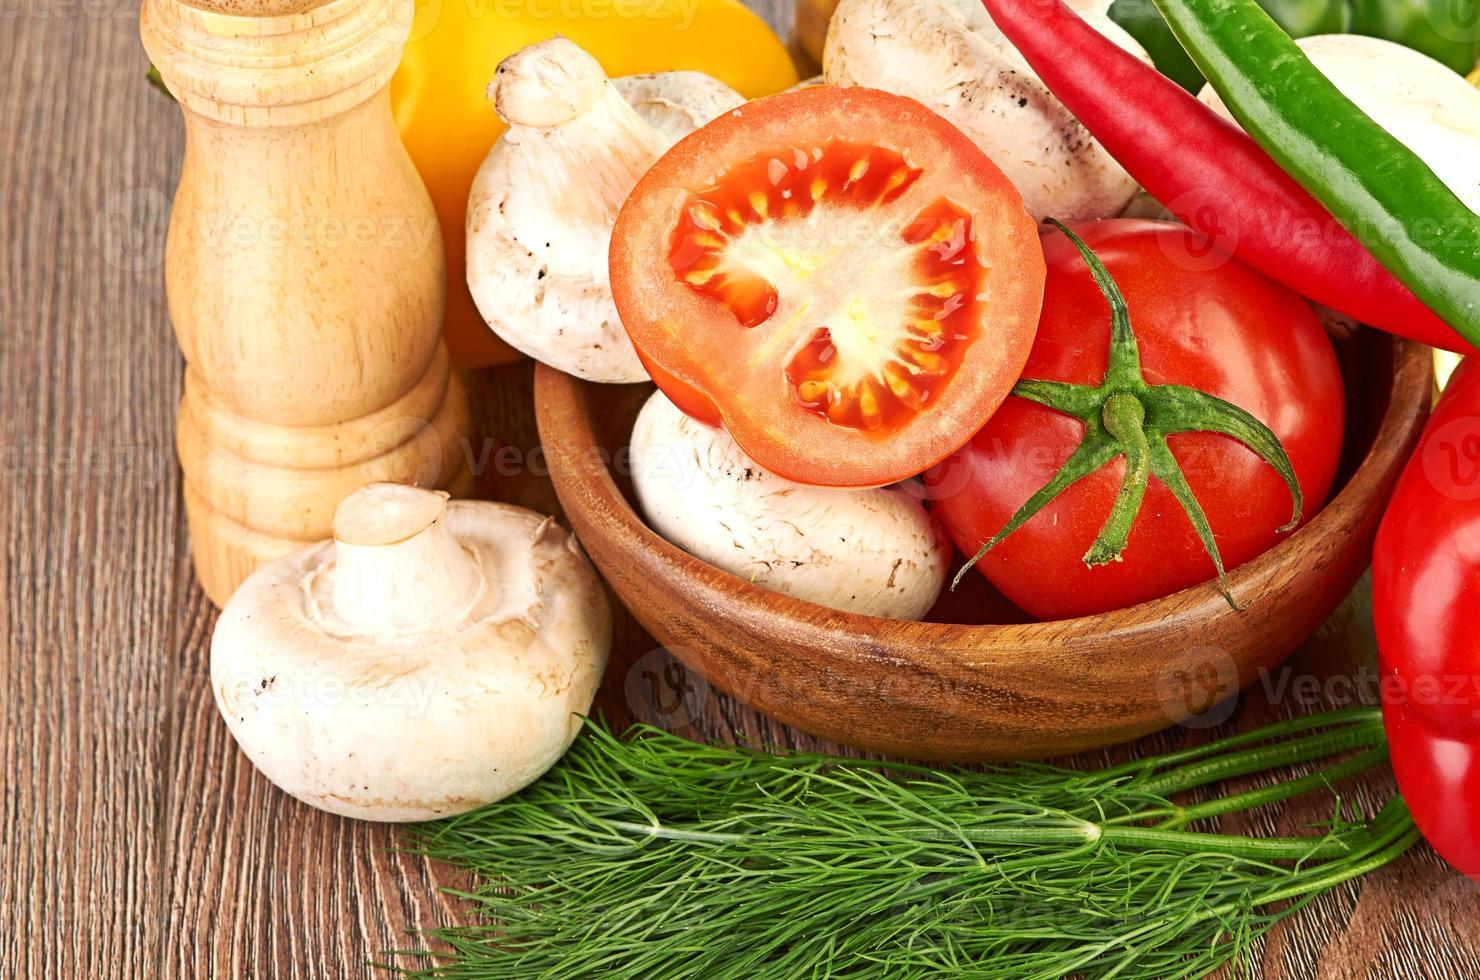 verdure fresche e funghi foto